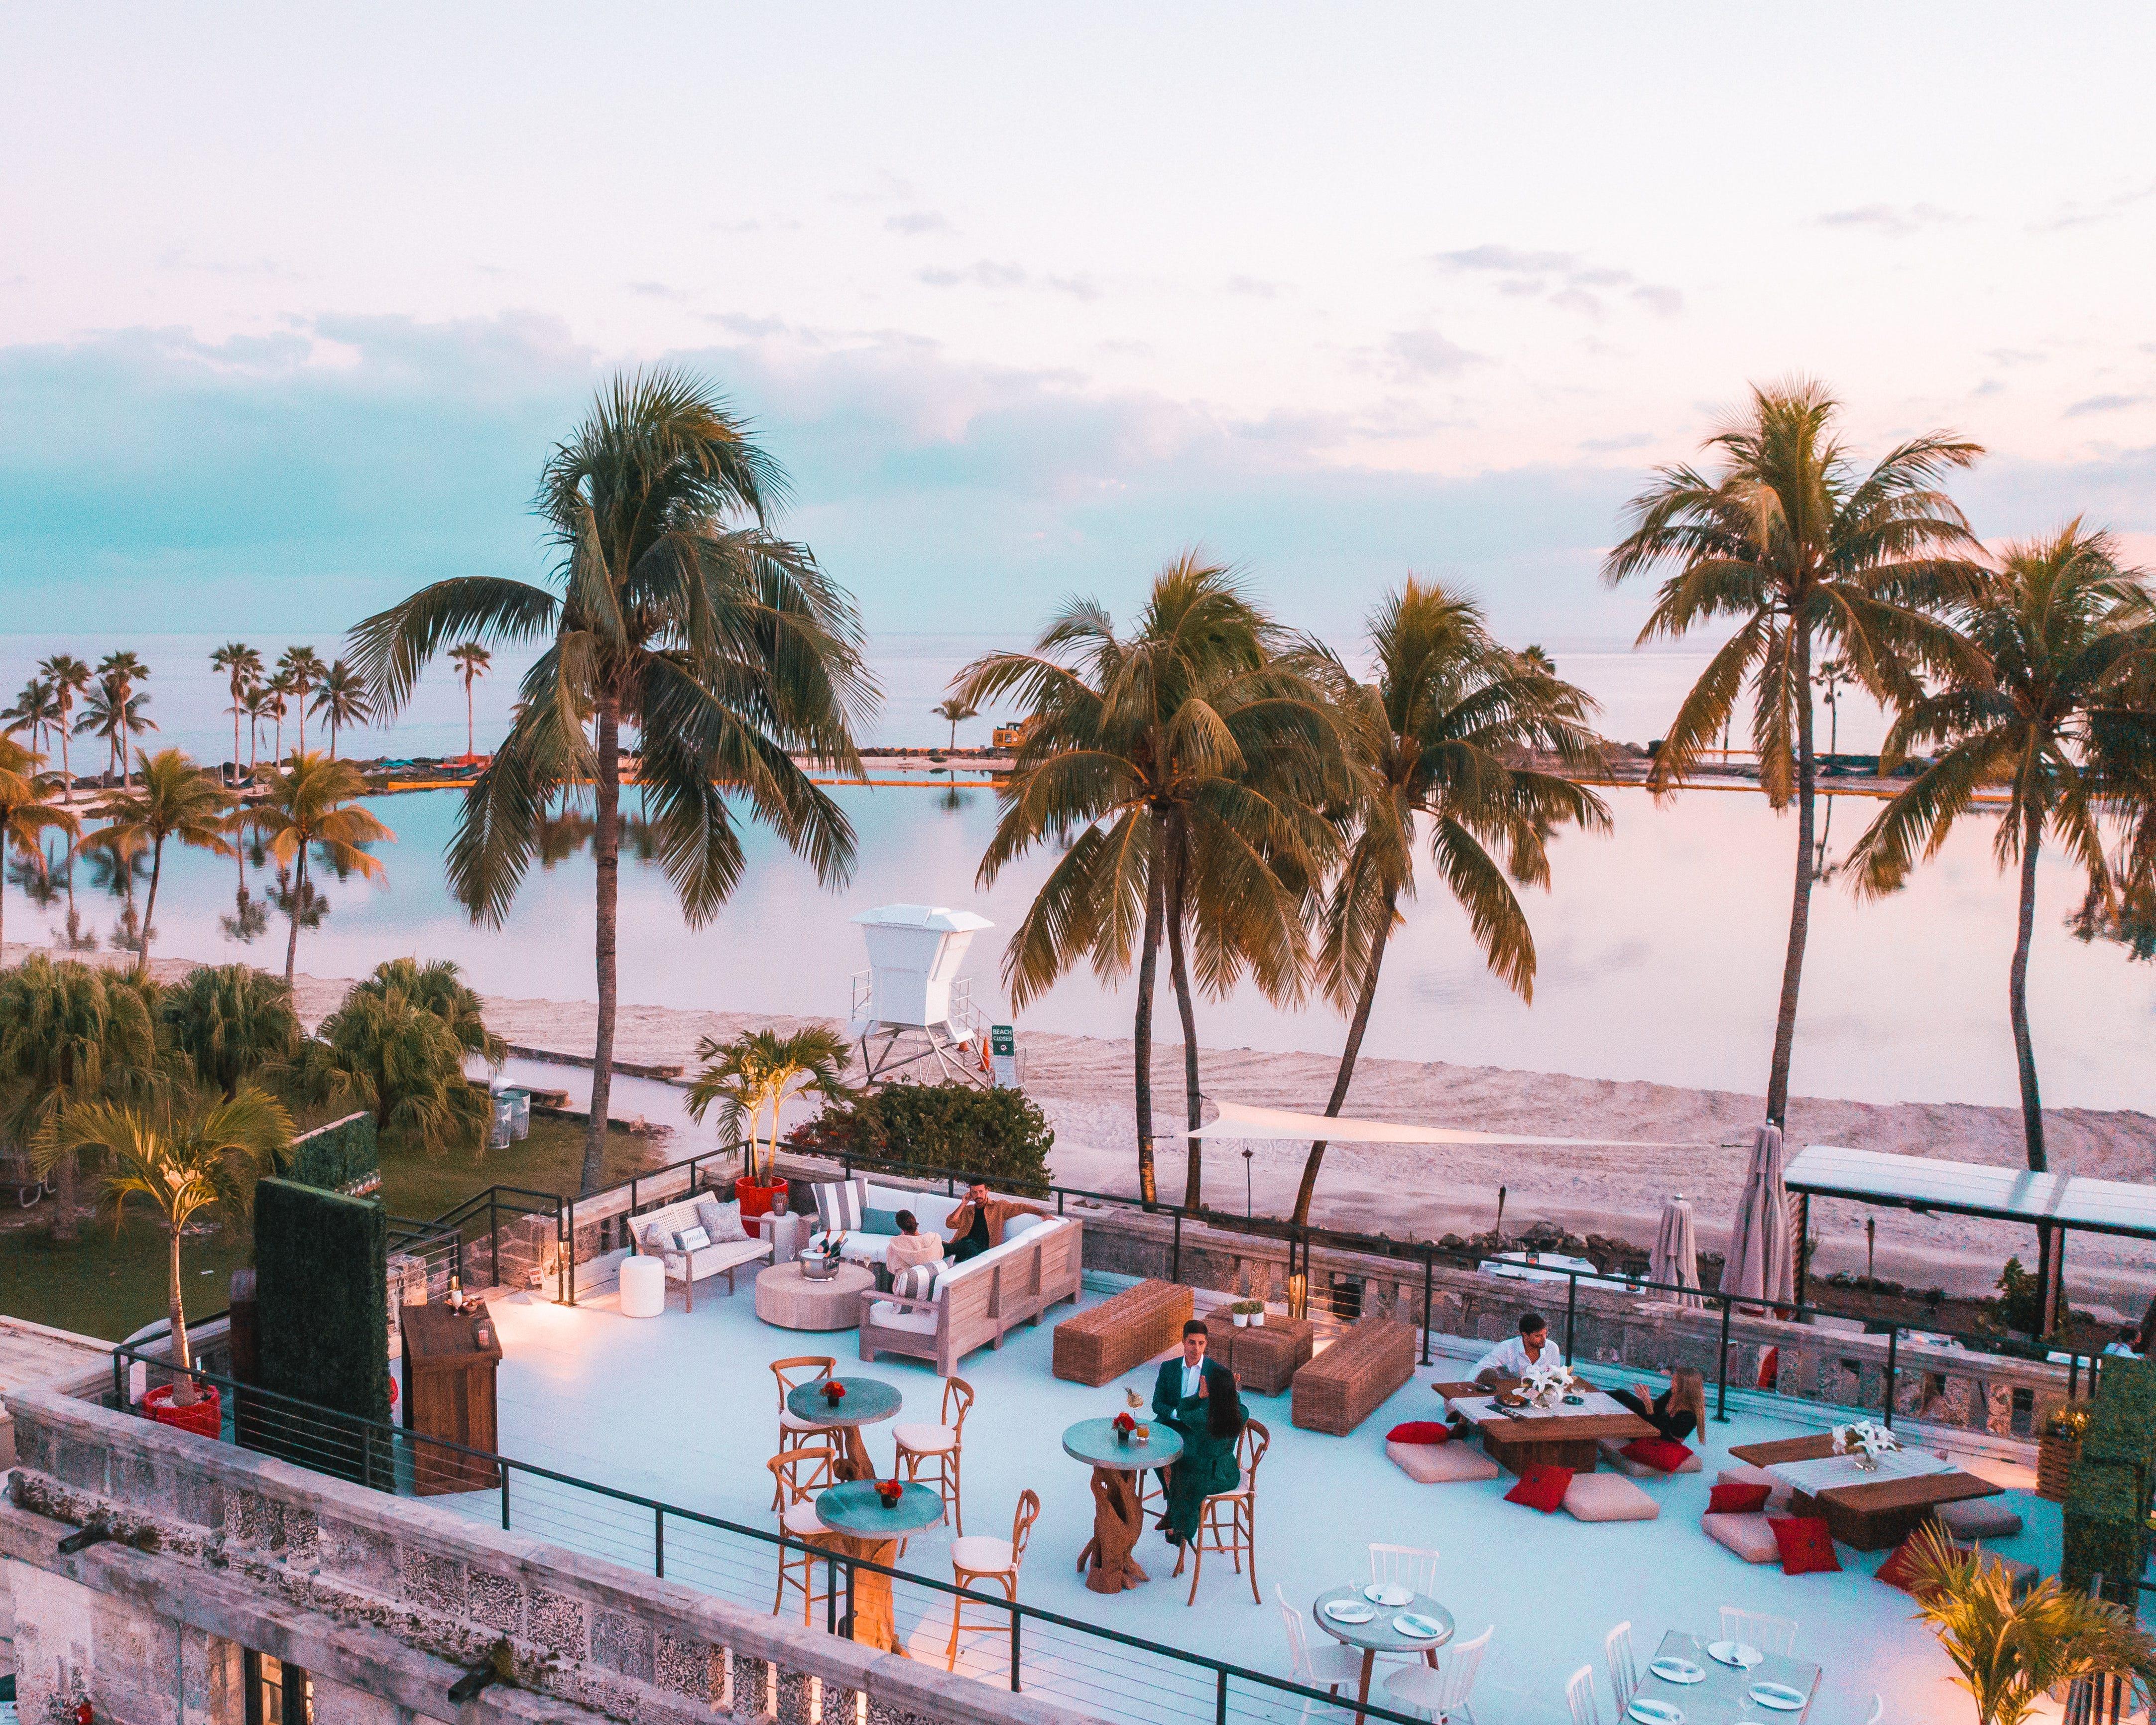 10 of our favorite beachfront restaurants across Florida